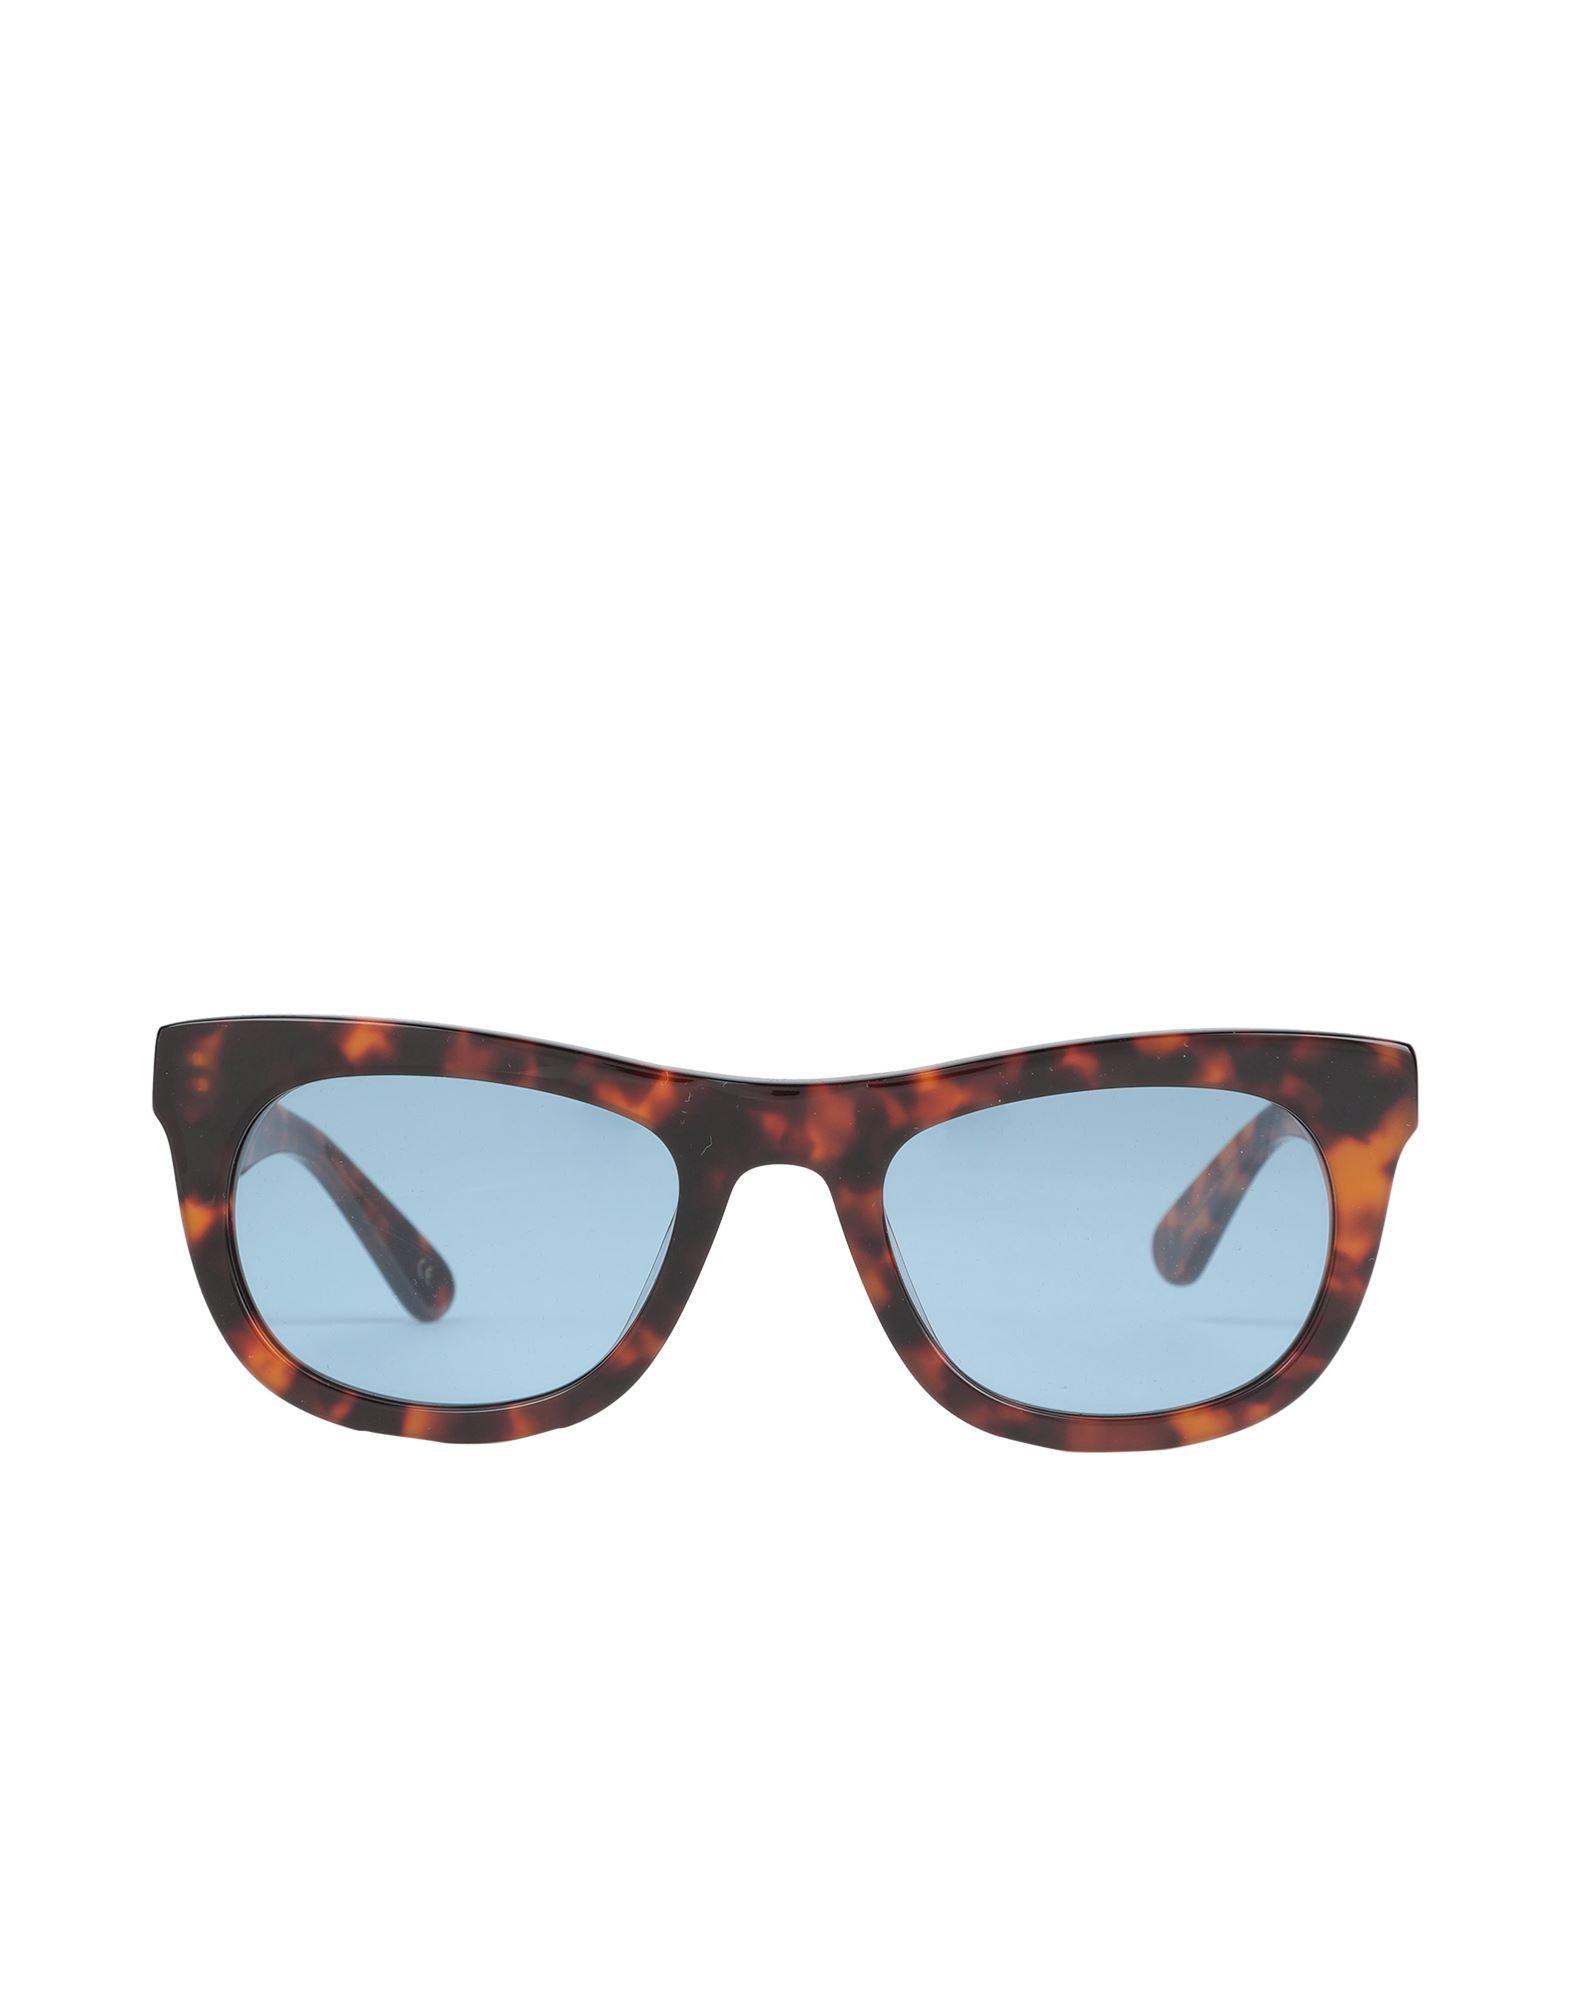 HAN KJØBENHAVN Sunglasses - Item 46737534